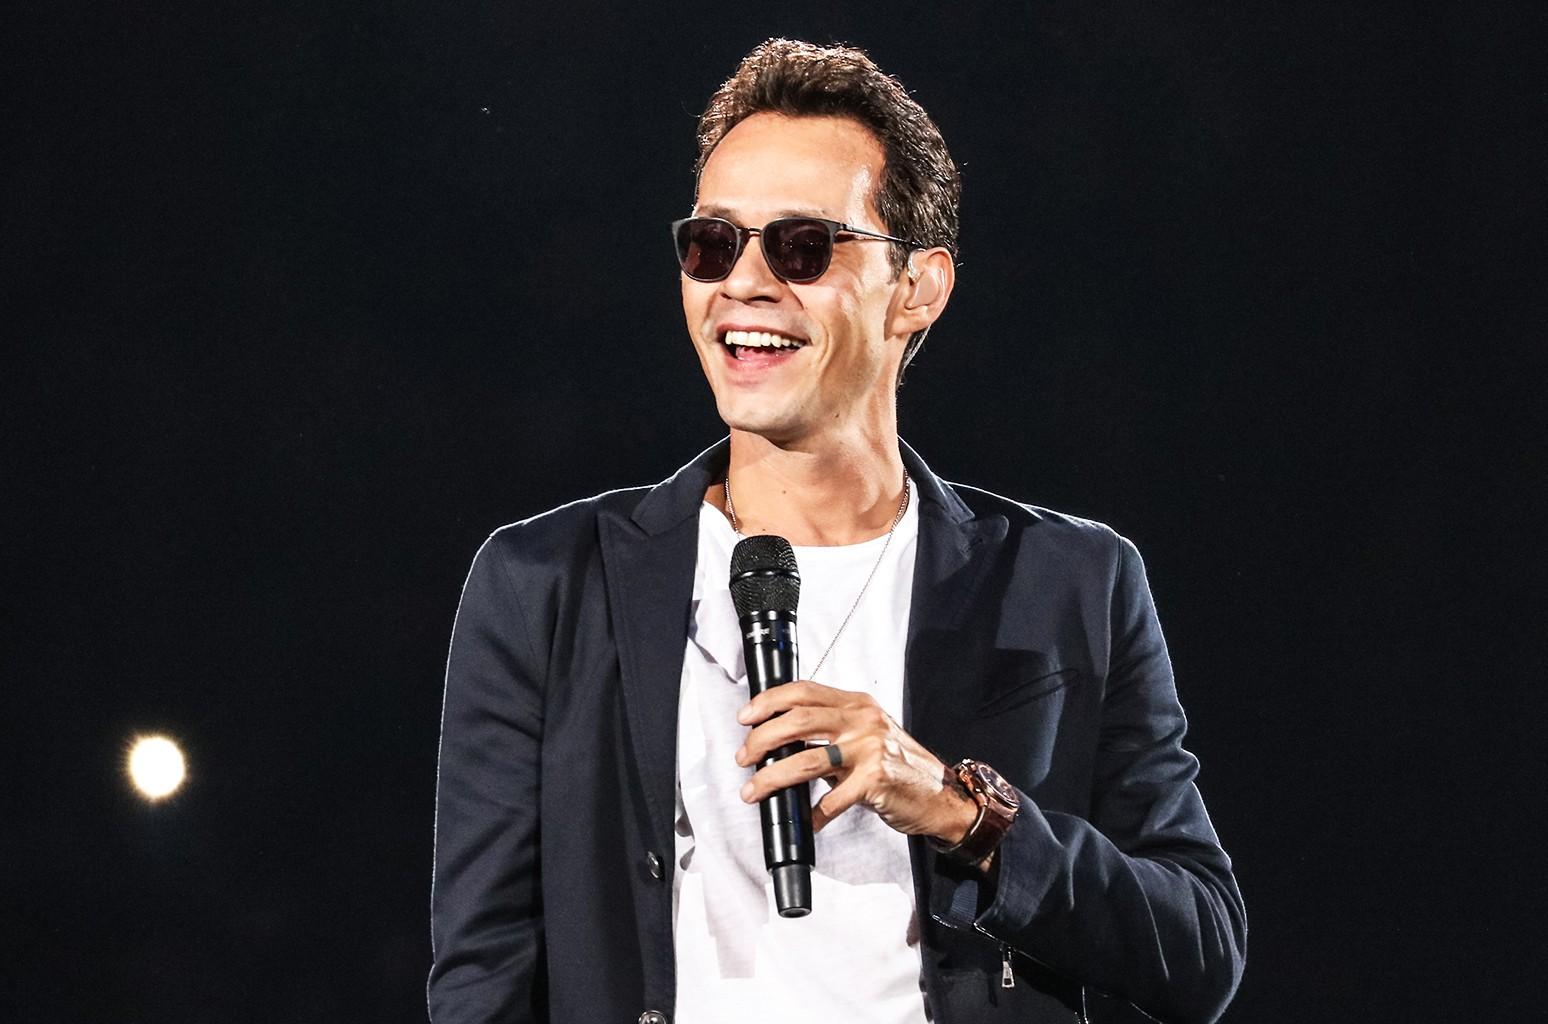 Marc Anthony's 'La Gozadera.' 'Valió La Pena' & More Get New Versions for Children's Music Album | Billboard